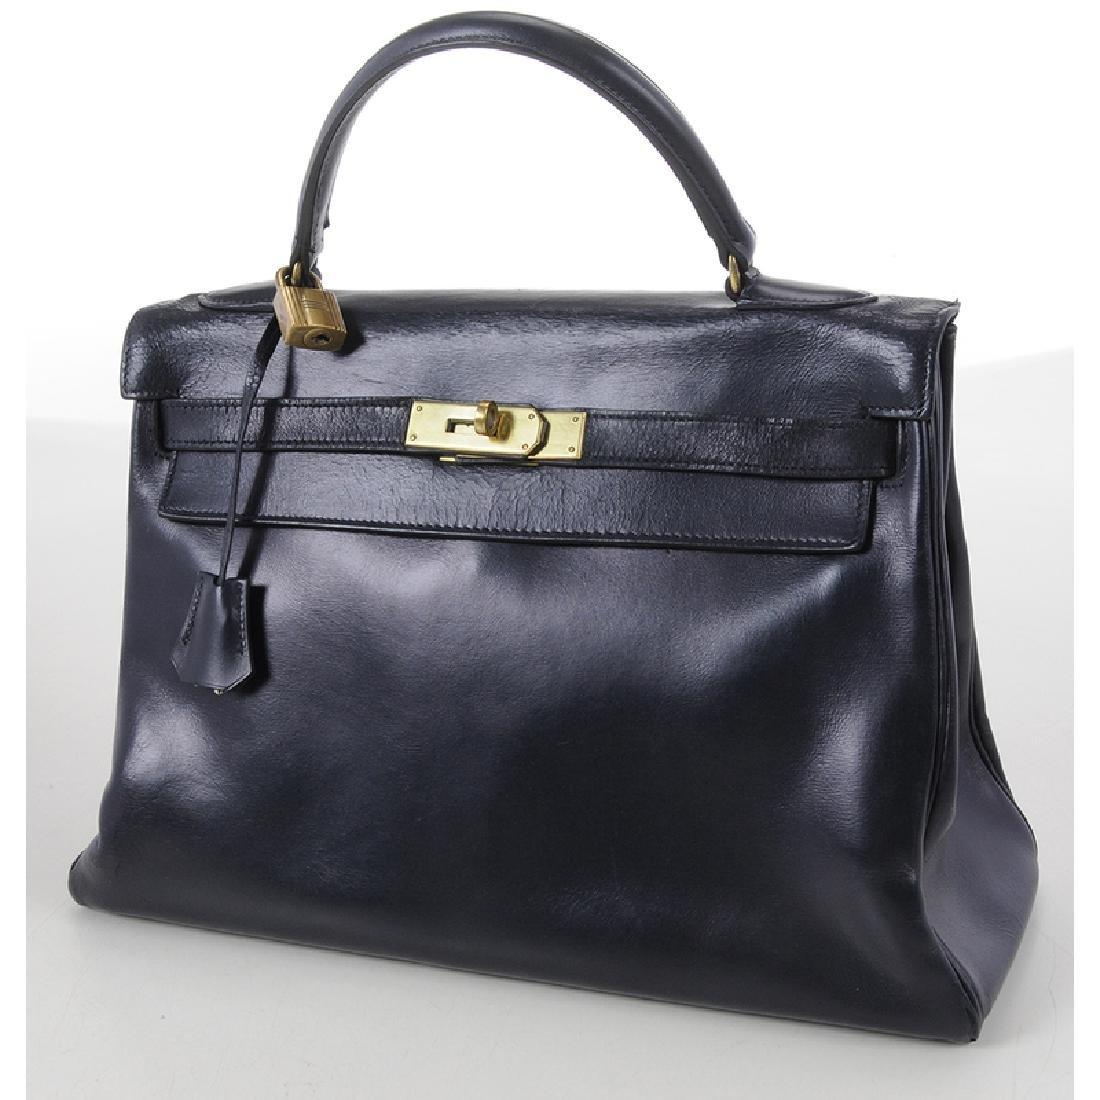 Hermes Blue Leather Kelly Handbag - 2